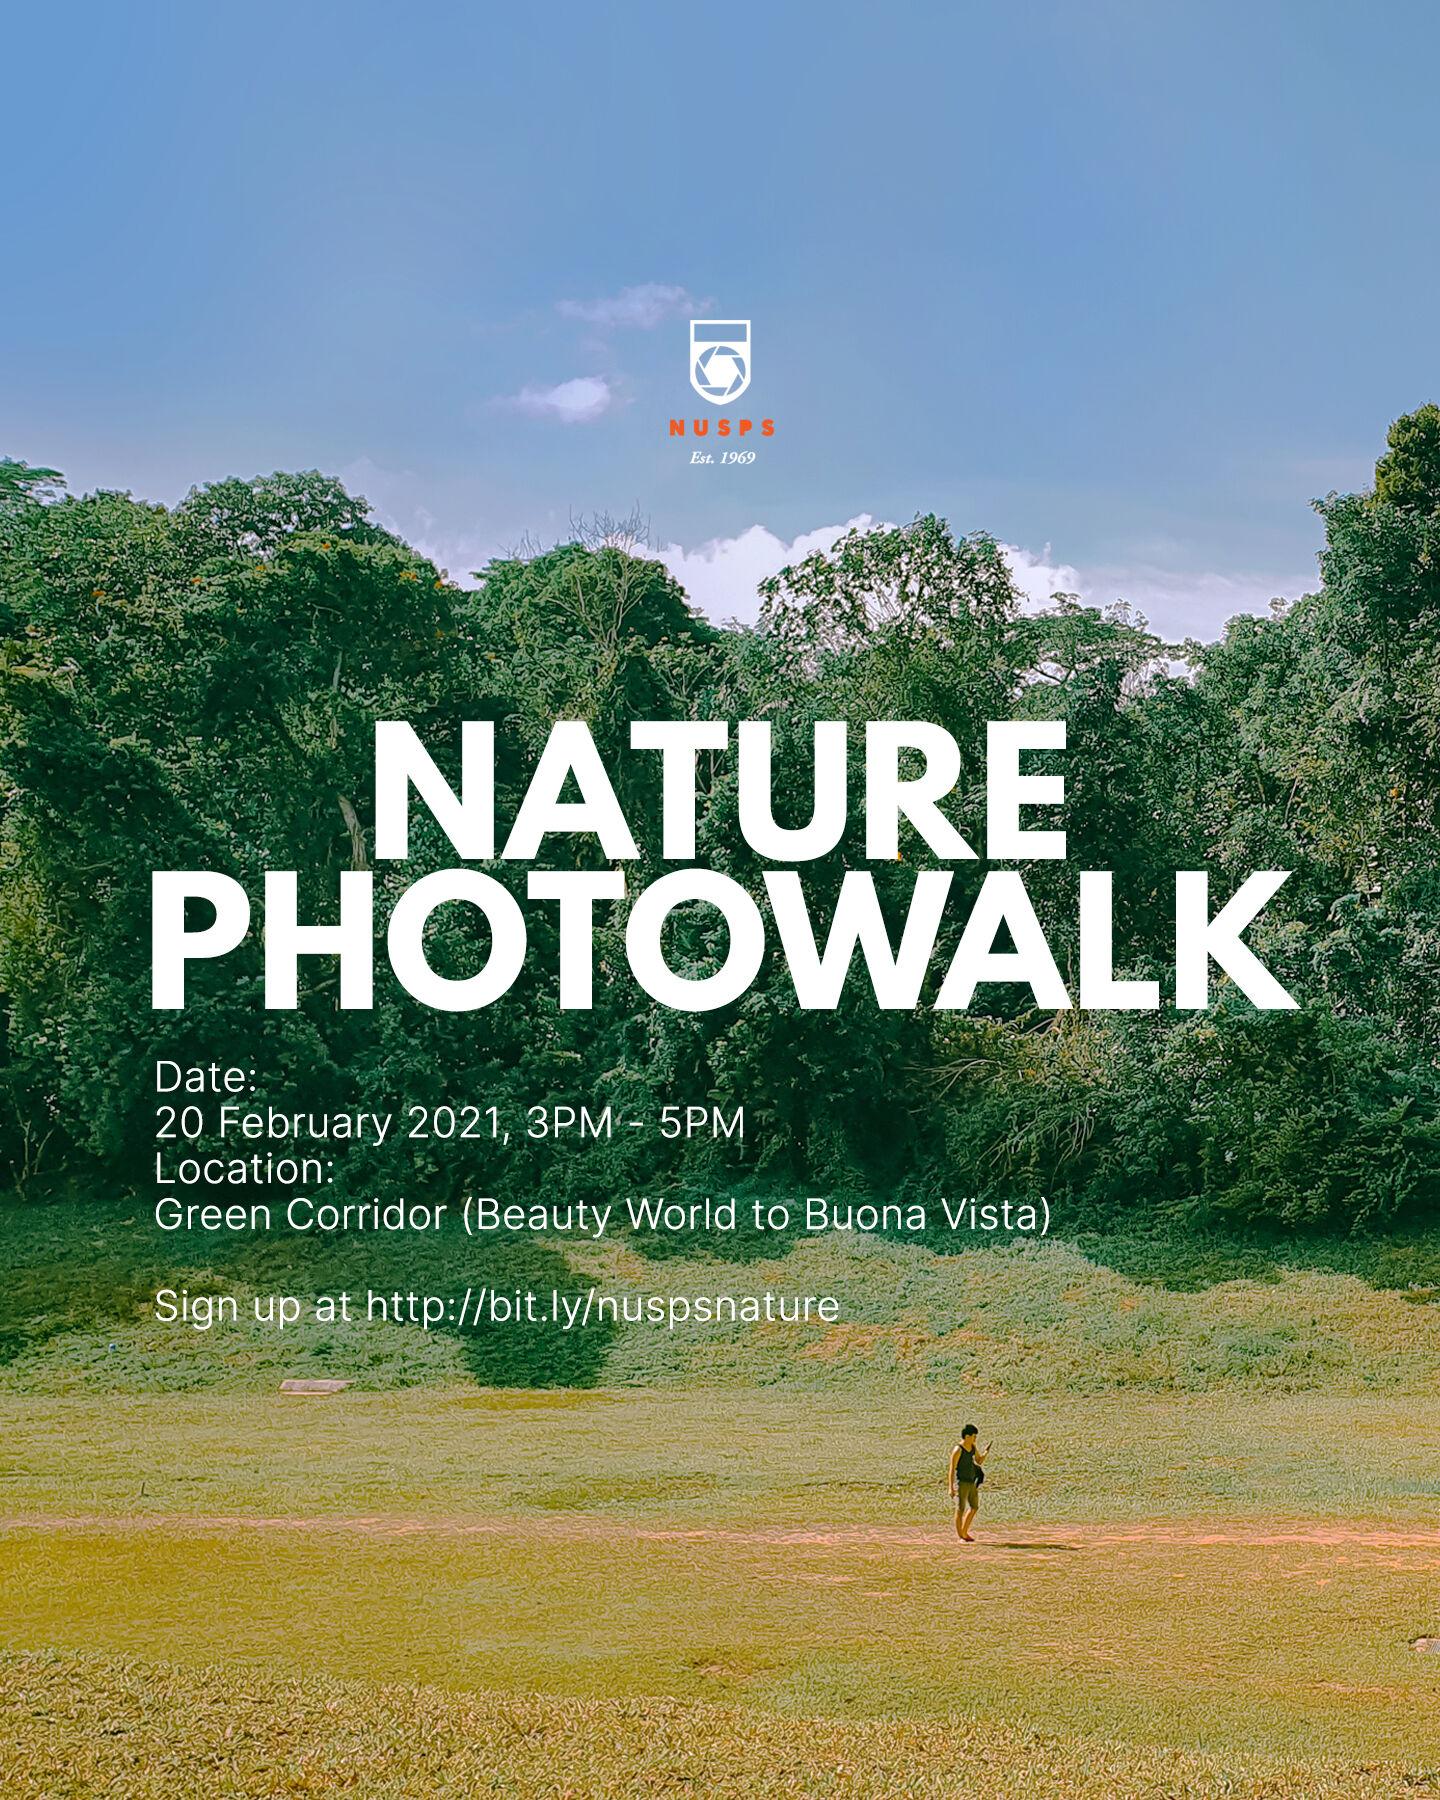 Nature Photowalk 2021 @ The Green Corridor